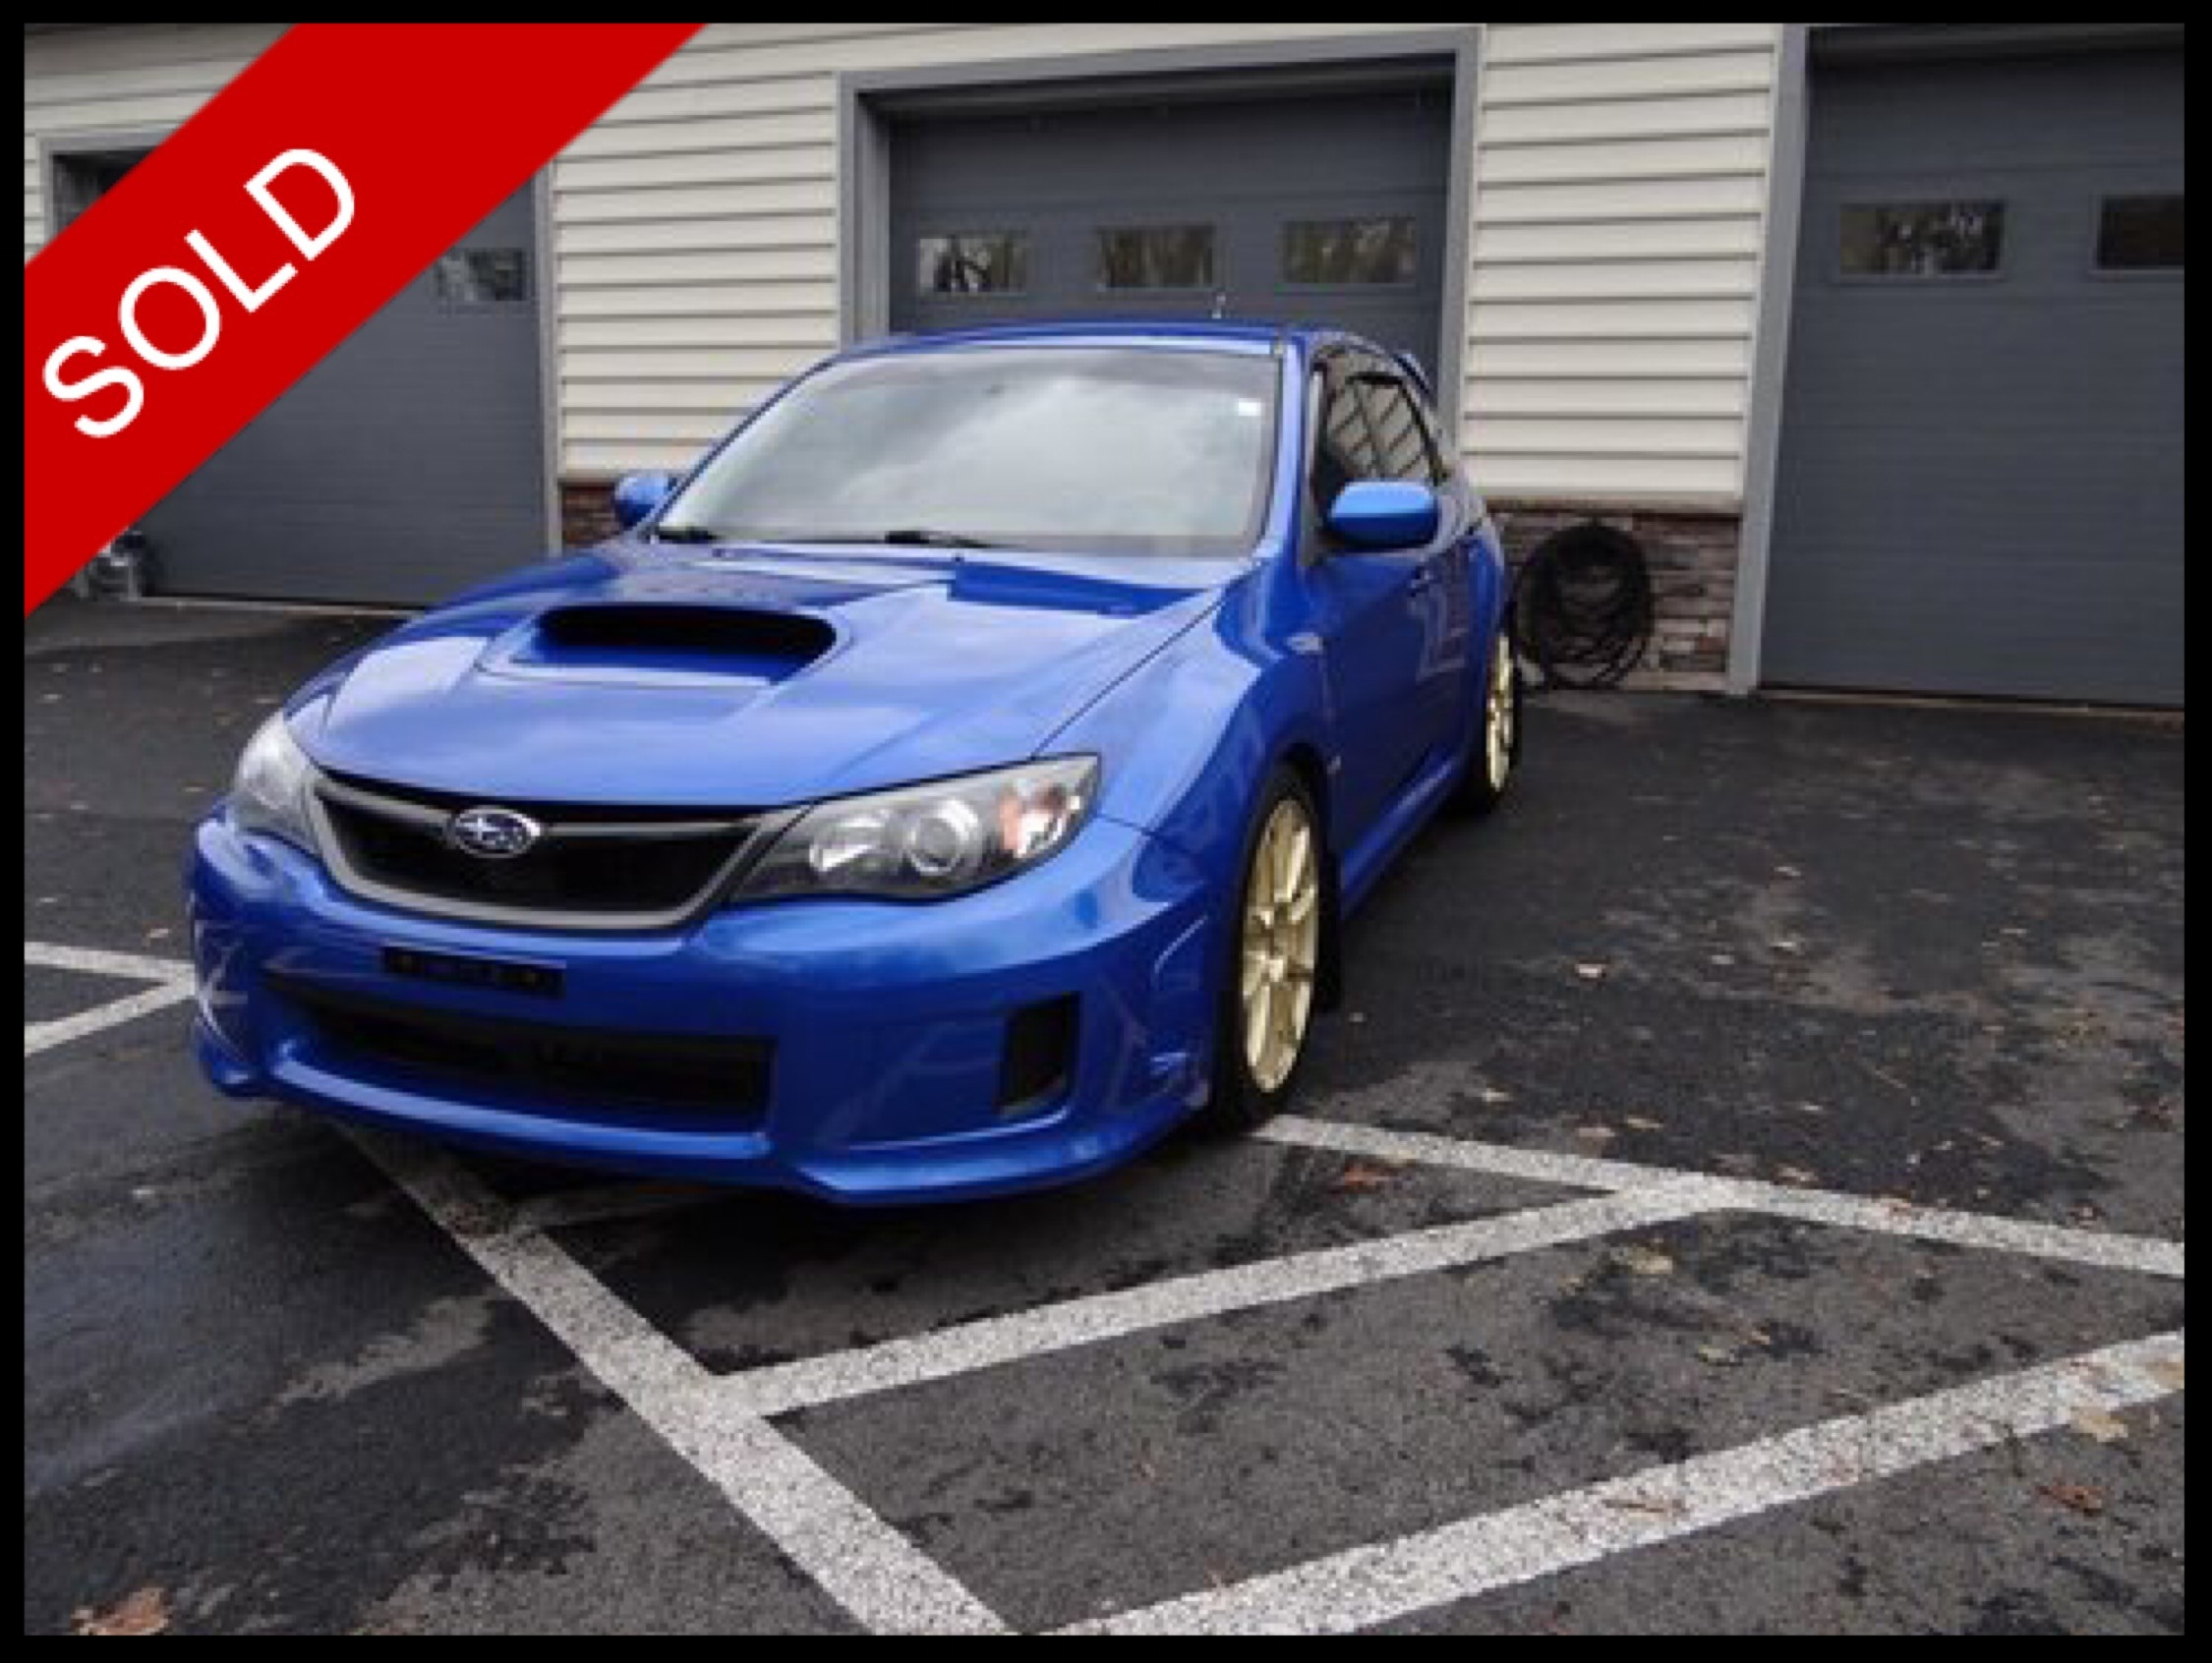 SOLD - 2014 Subaru Impreza WRX HatchbackWR Blue on BlackVIN: JF1GR7E69EG261626